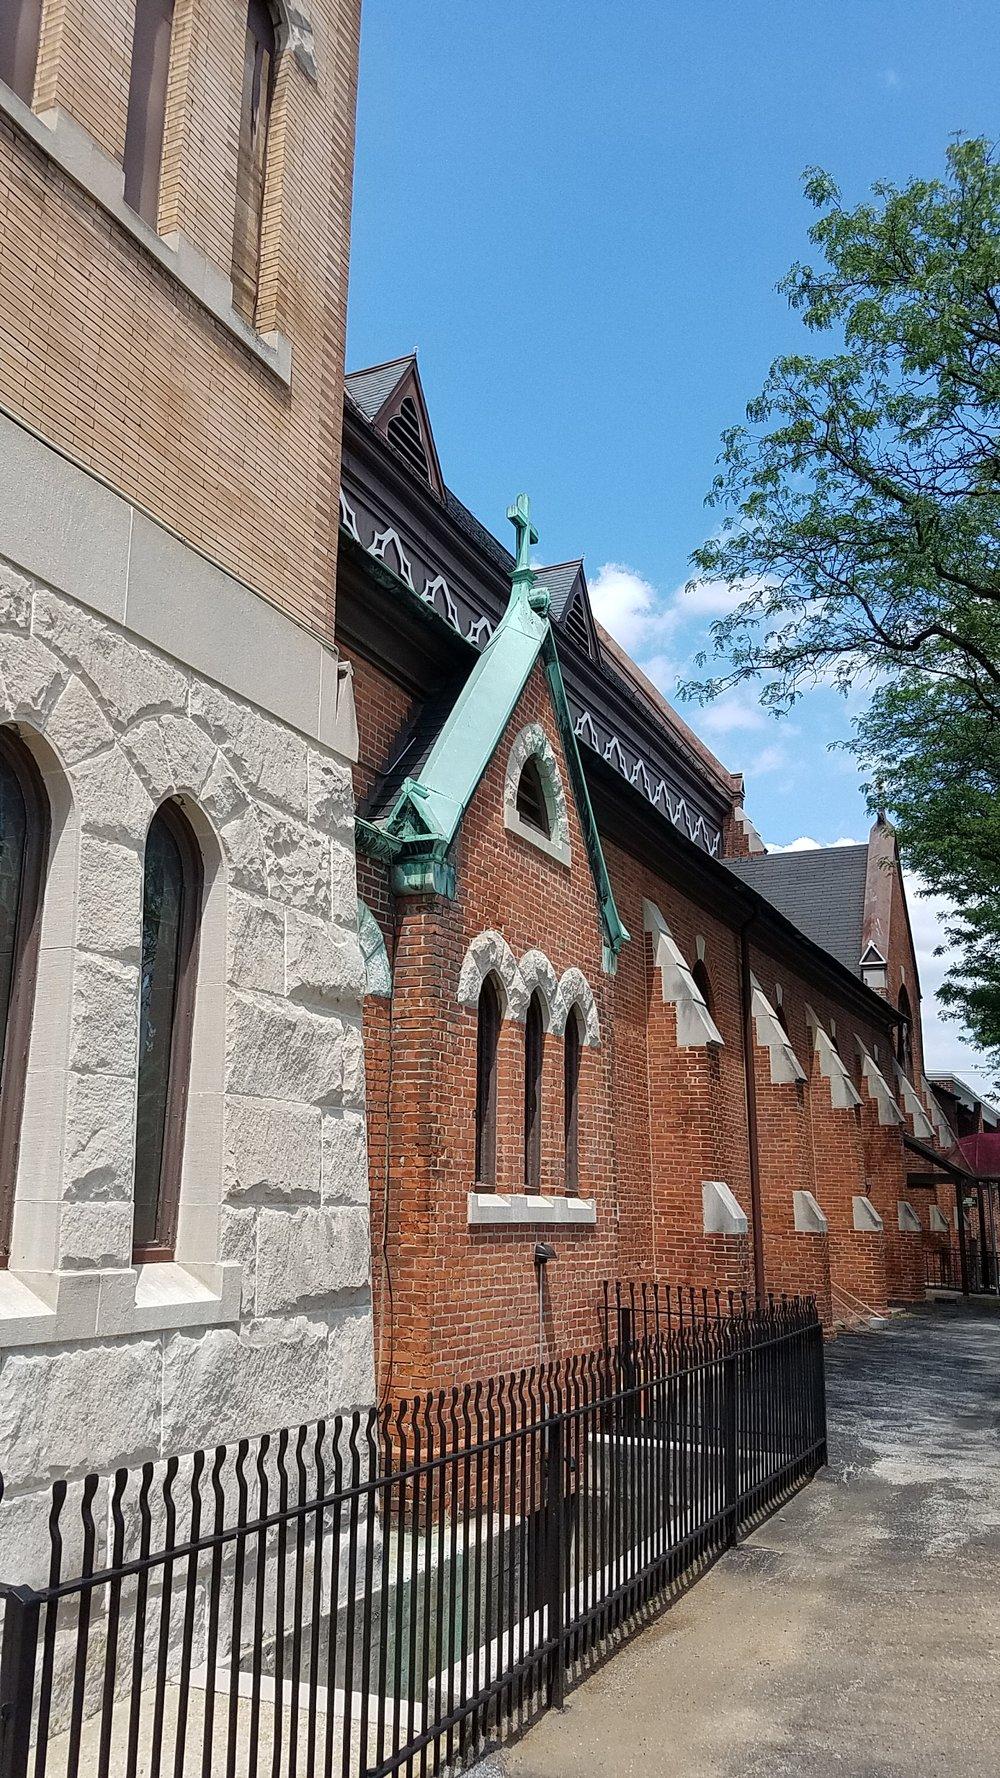 St. Patrick Catholic Church on South Beaver Street in York, Pennsylvania